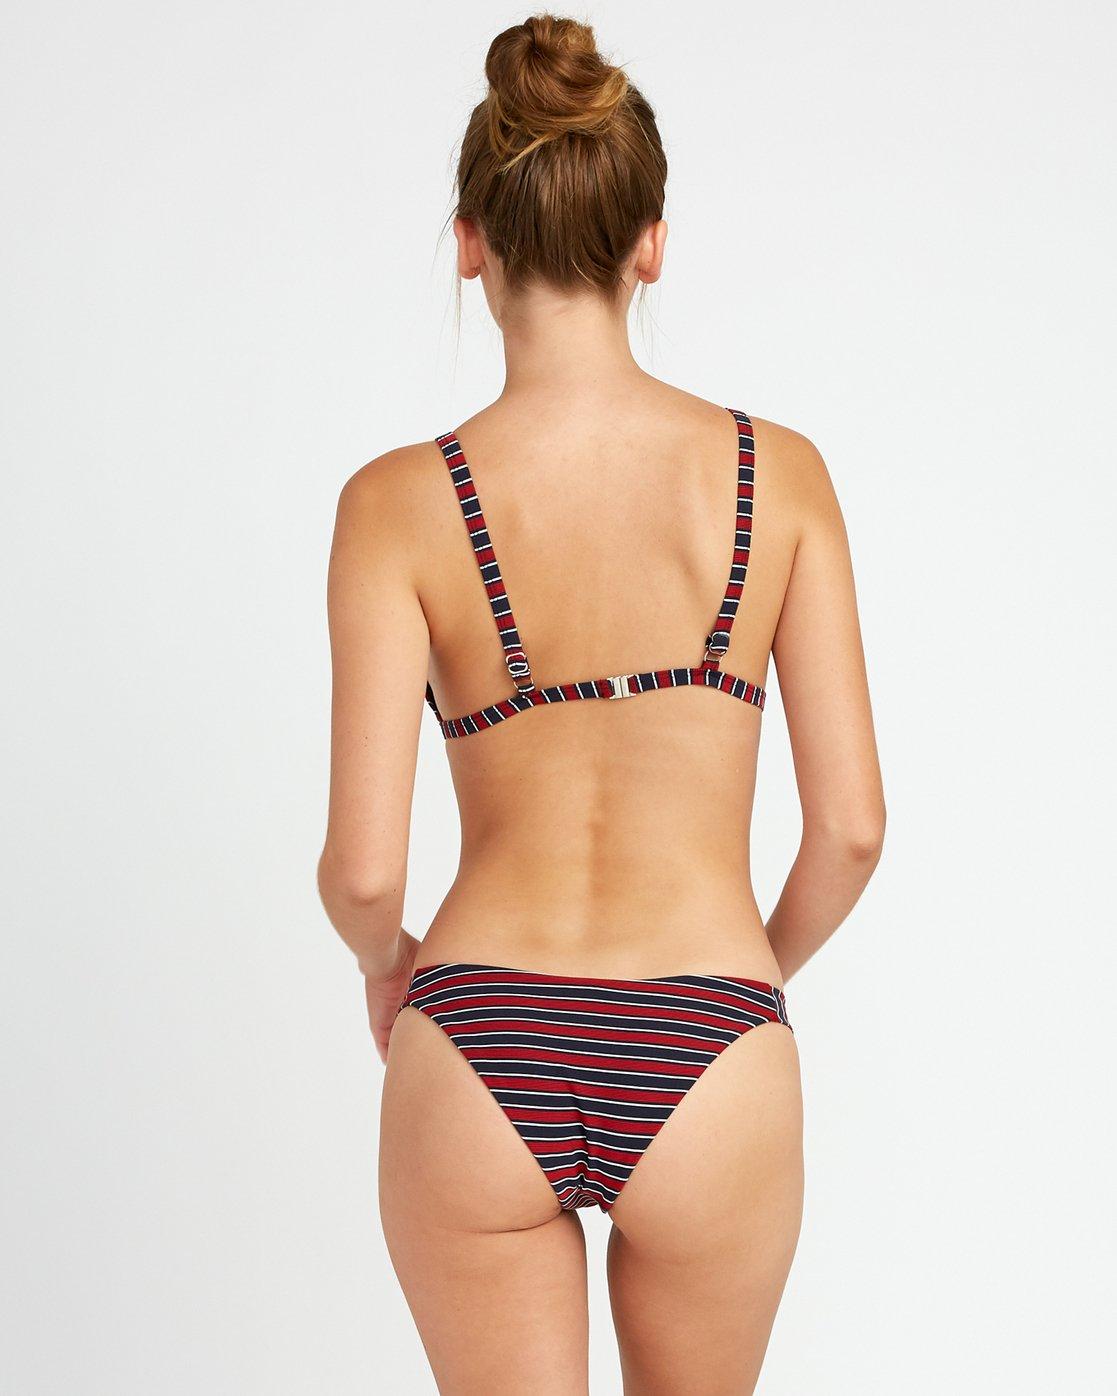 0 Red White Rvca Medium Striped Bikini Bottoms Blue P3SBRARVS9 RVCA